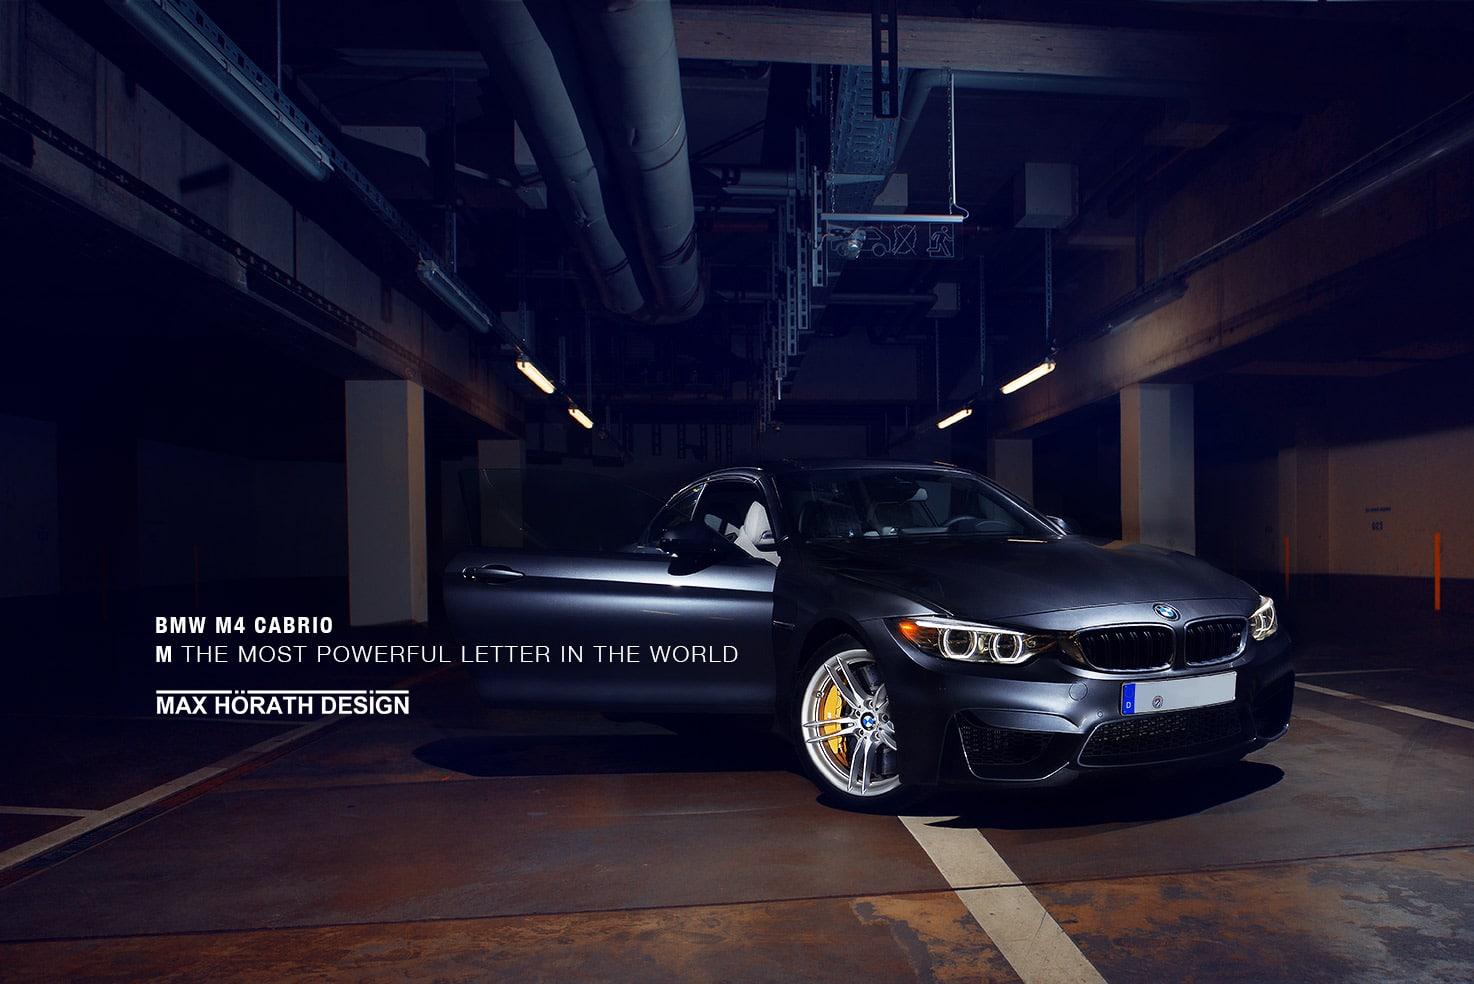 Autofotografie BMW M4 Cabrio M GmbH – Carshooting Auto Fotos Bilder DIY